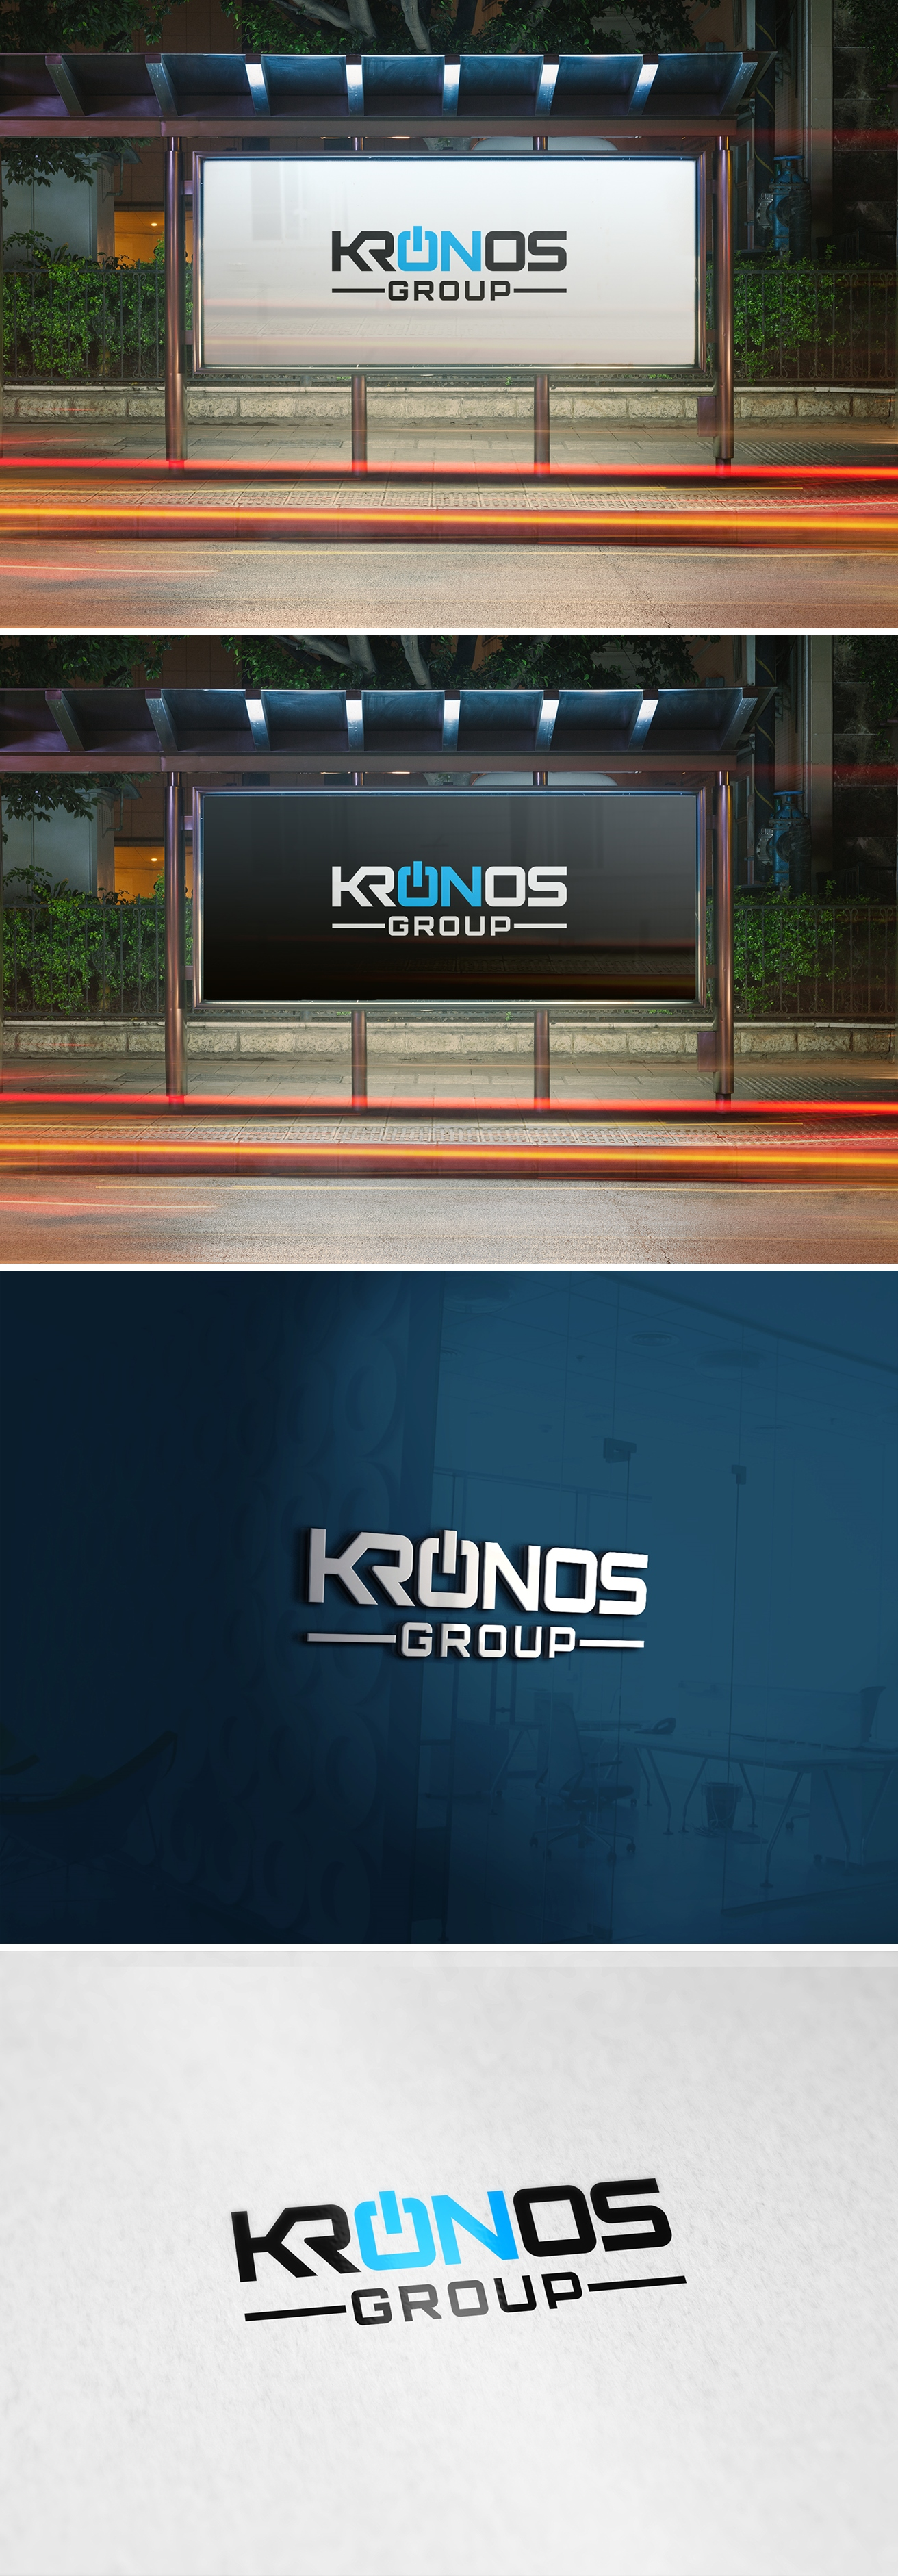 Разработать логотип KRONOS фото f_3745fafeb9609656.jpg